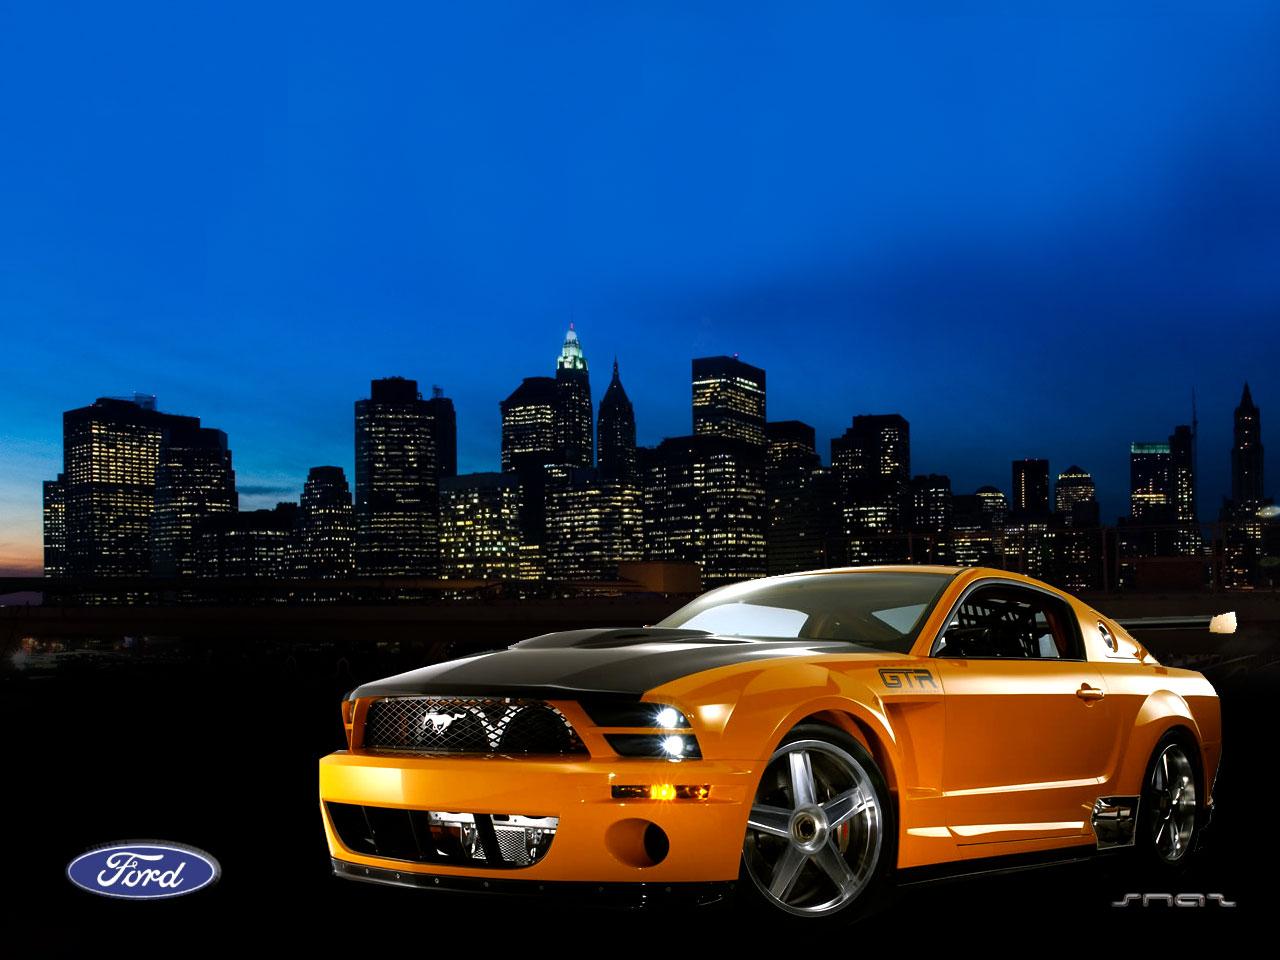 http://2.bp.blogspot.com/-ACkgr80xBT8/UFc5EFIELgI/AAAAAAAADSo/nA8Gxdd9wyI/s1600/Ford+Wallpapers+4.jpg